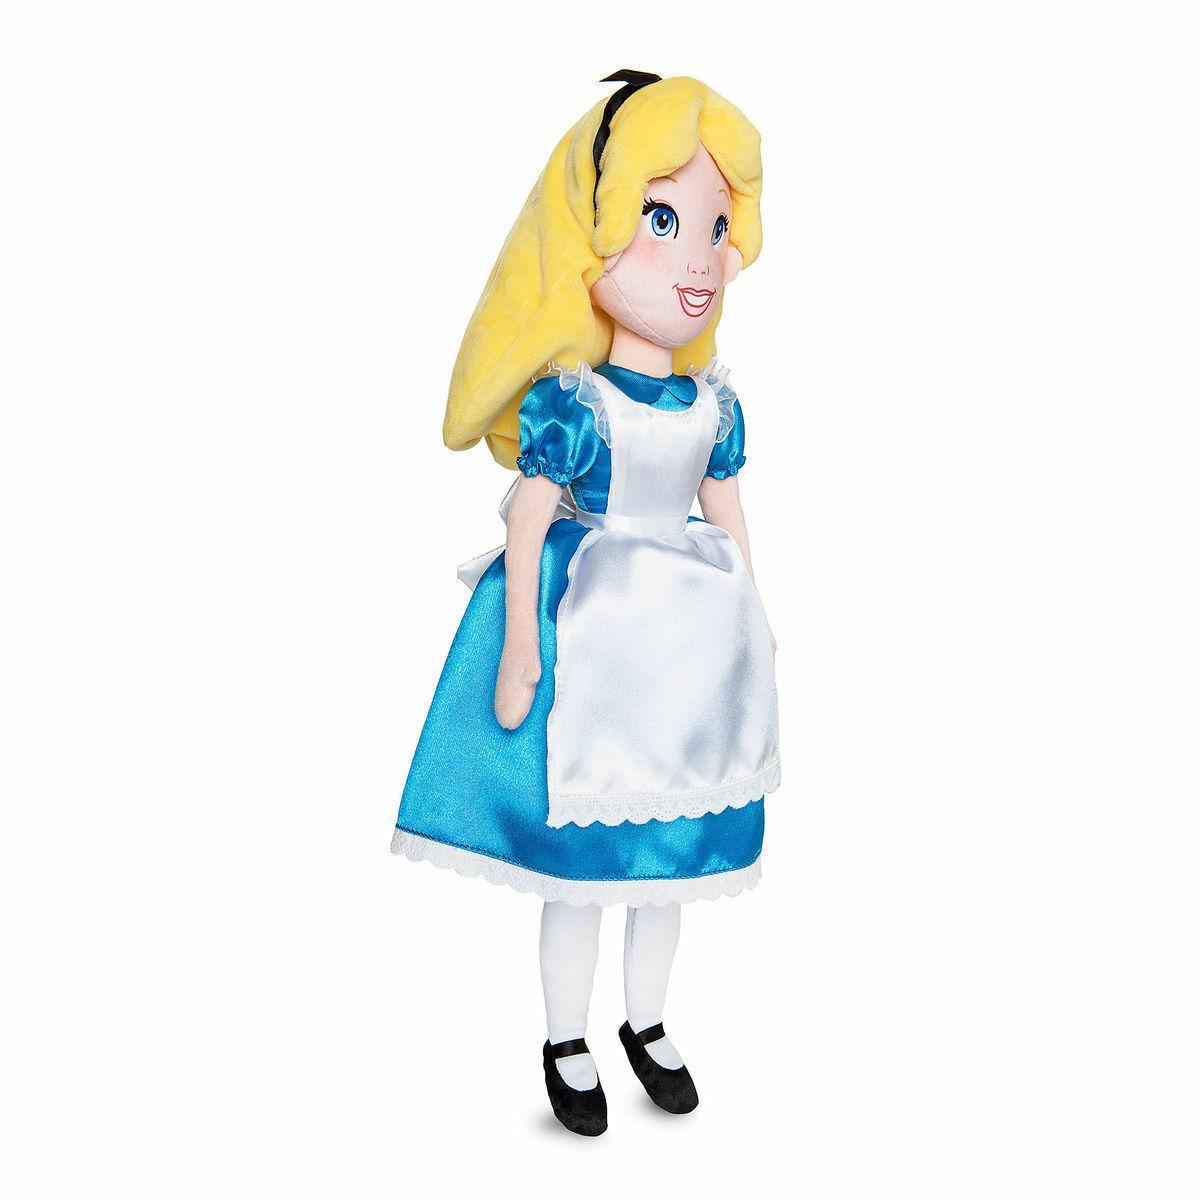 Disney Authentic Alice in Wonderland Doll